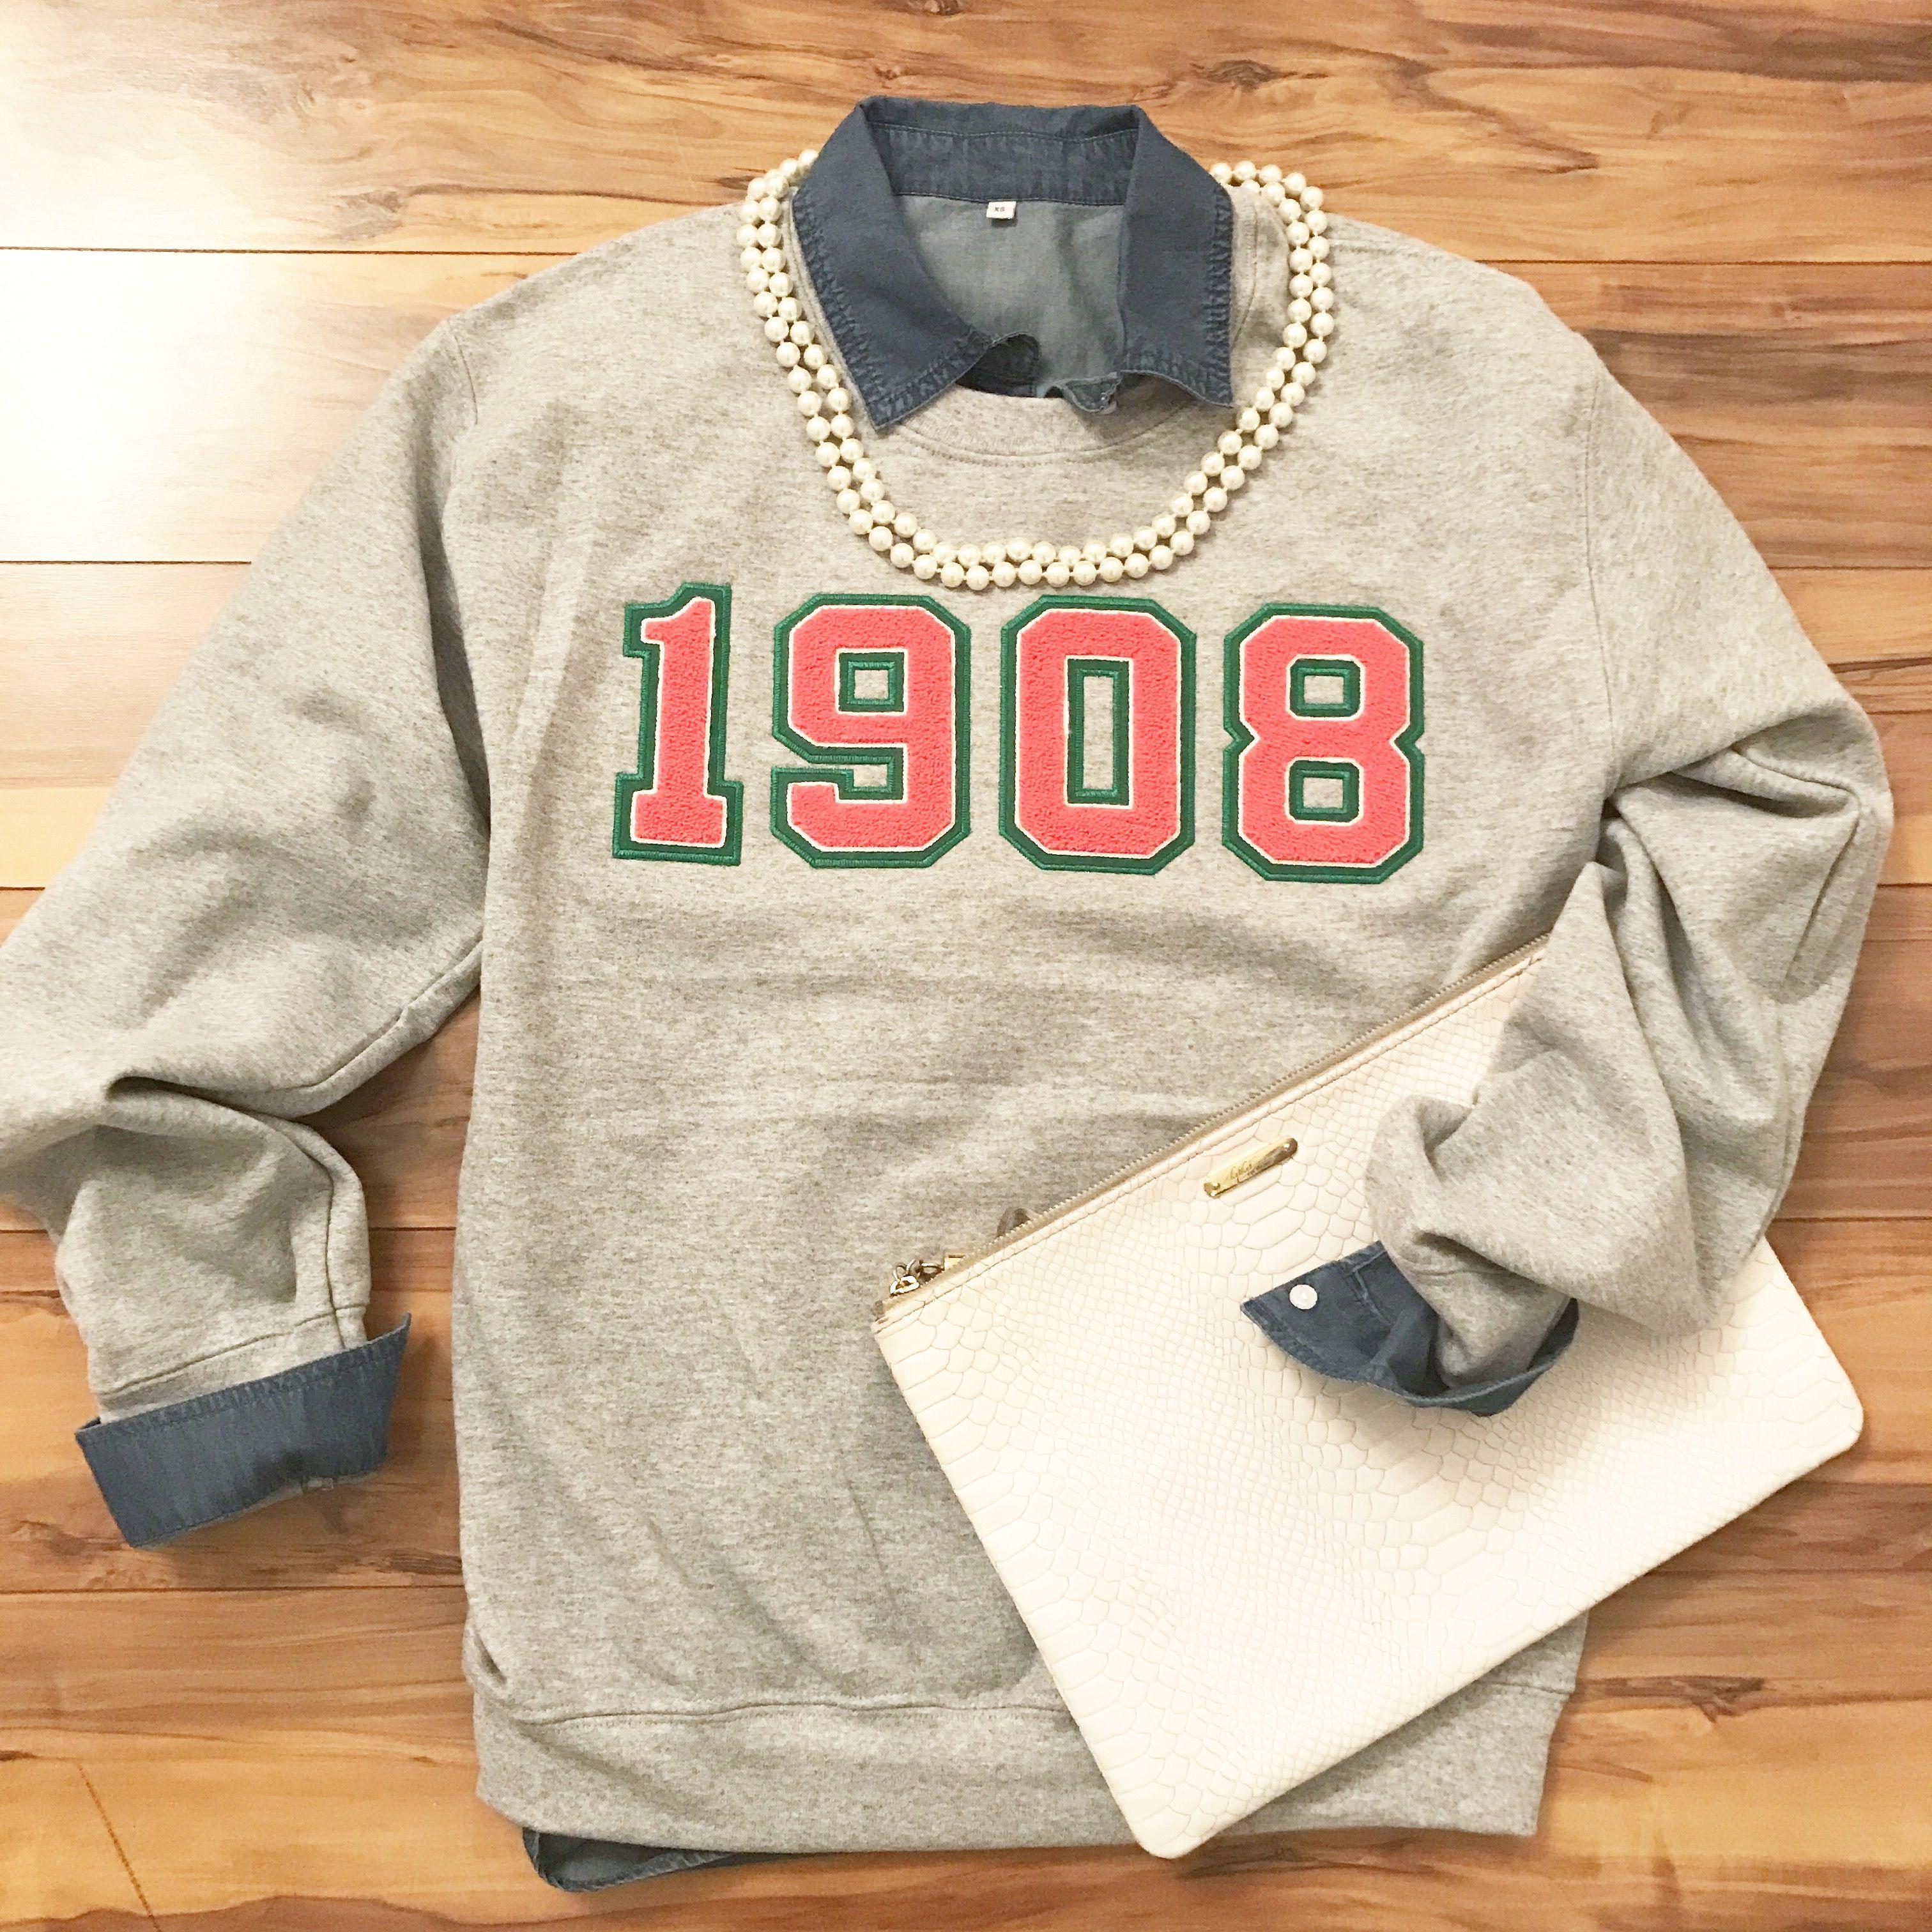 Fashionably Greek s Alpha Kappa Alpha Gray 1908 sweatshirts.  316debcbf